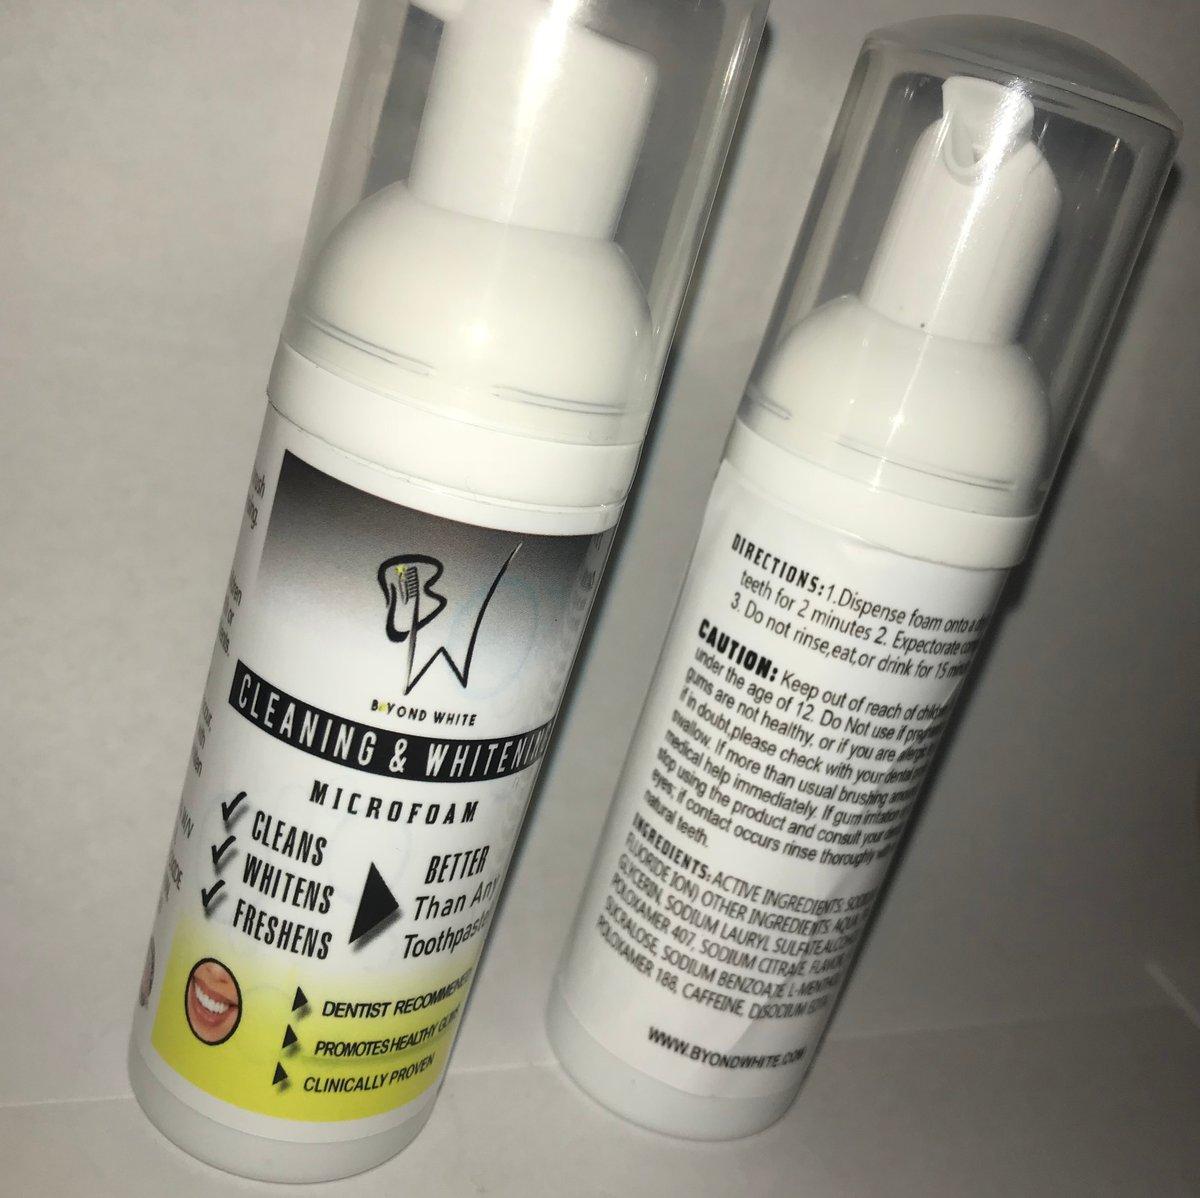 Image of Cleansing Whitening Microfoam